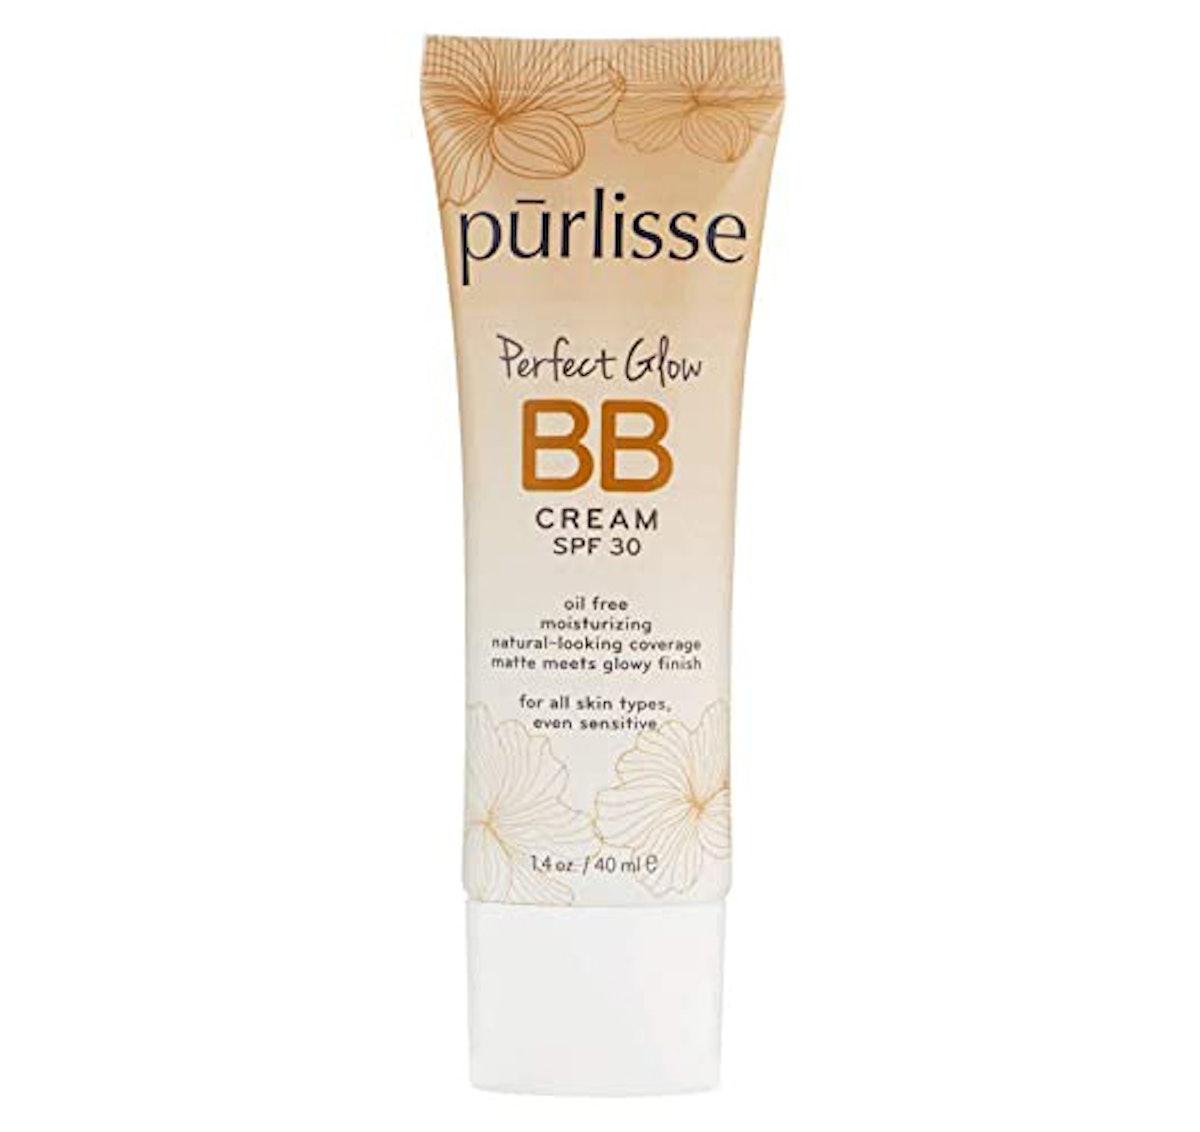 purlisse BB Tinted Moisturizer Cream SPF 30